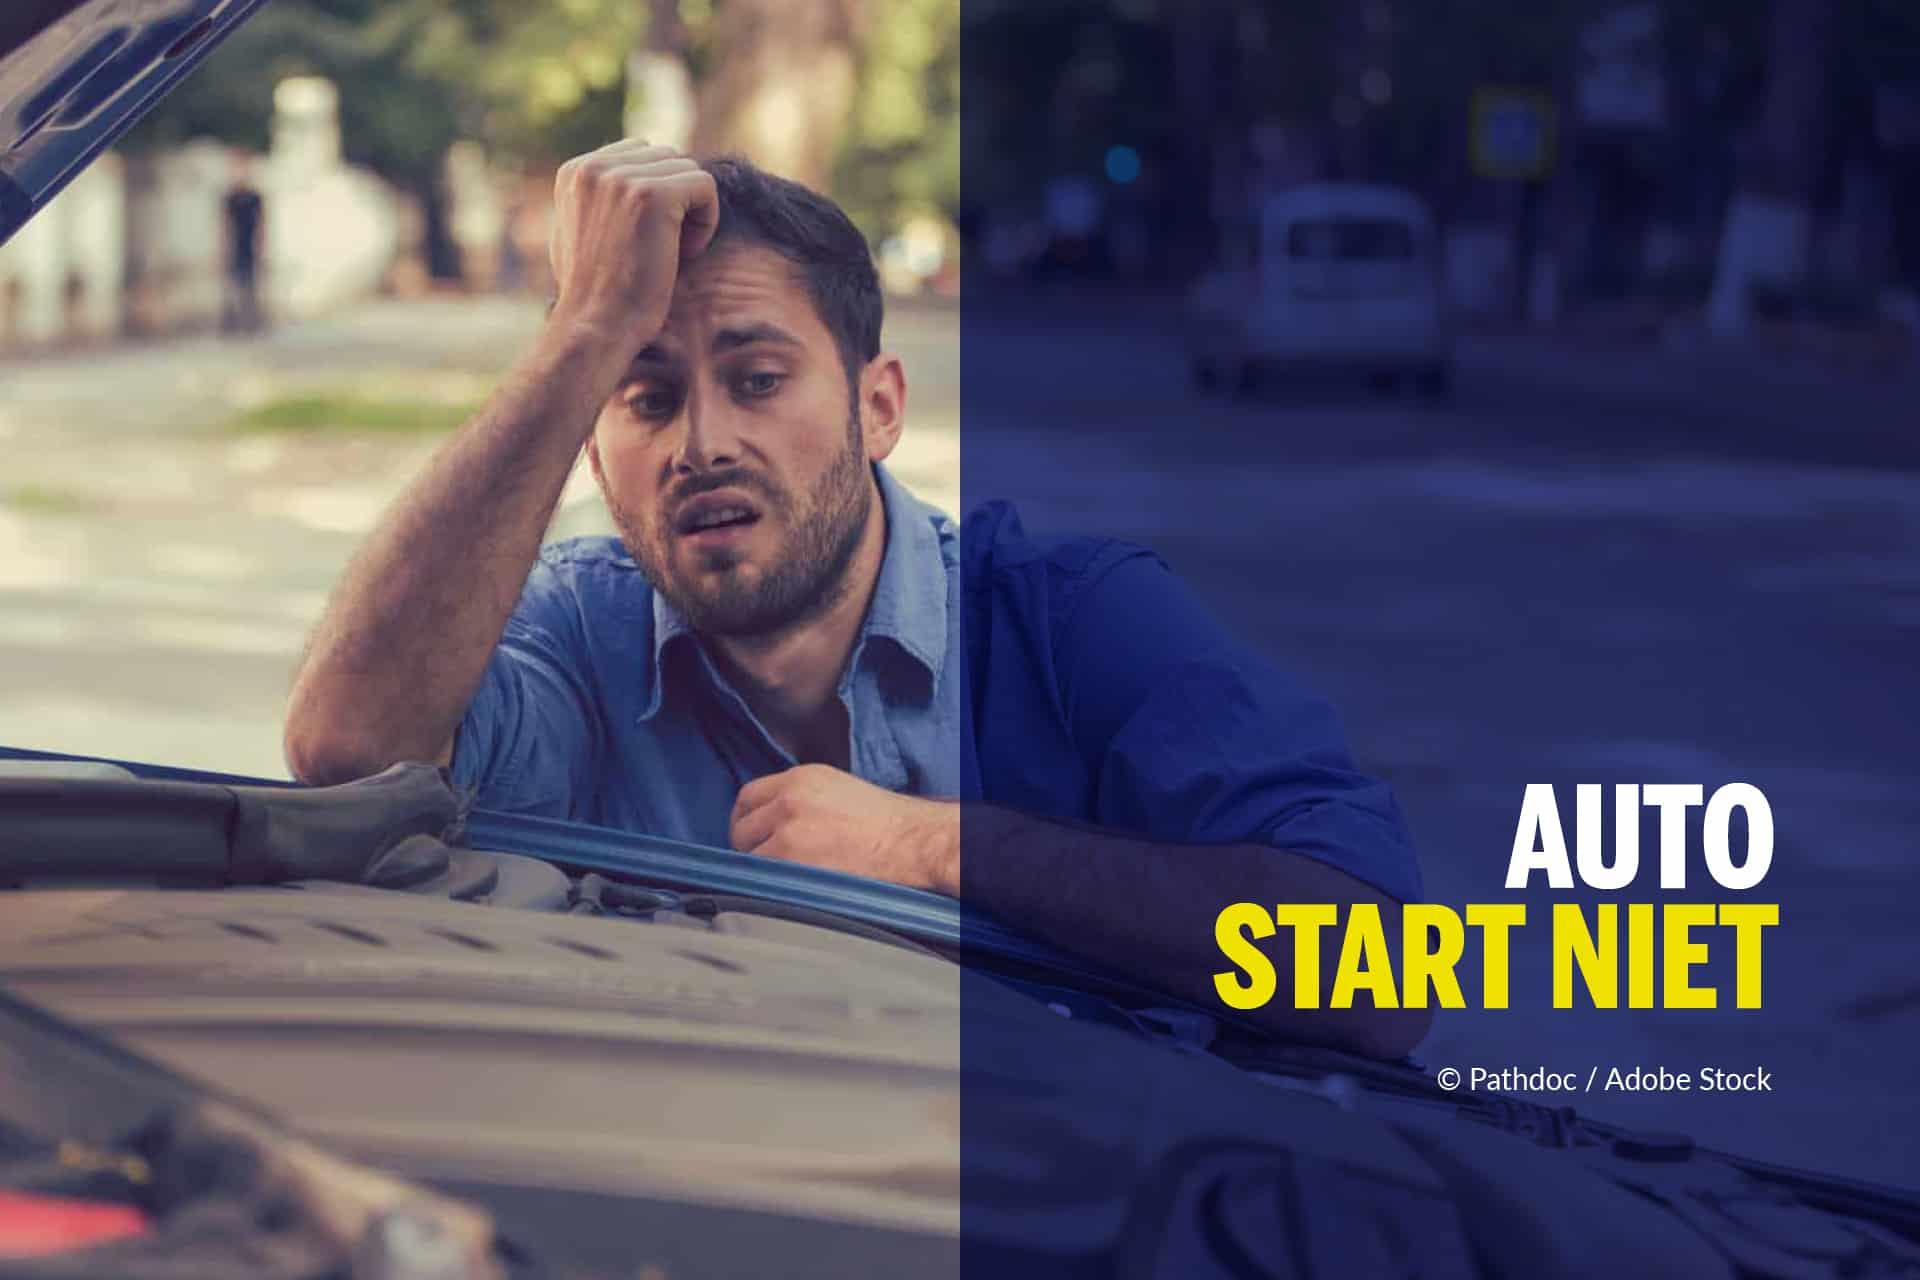 Auto start niet